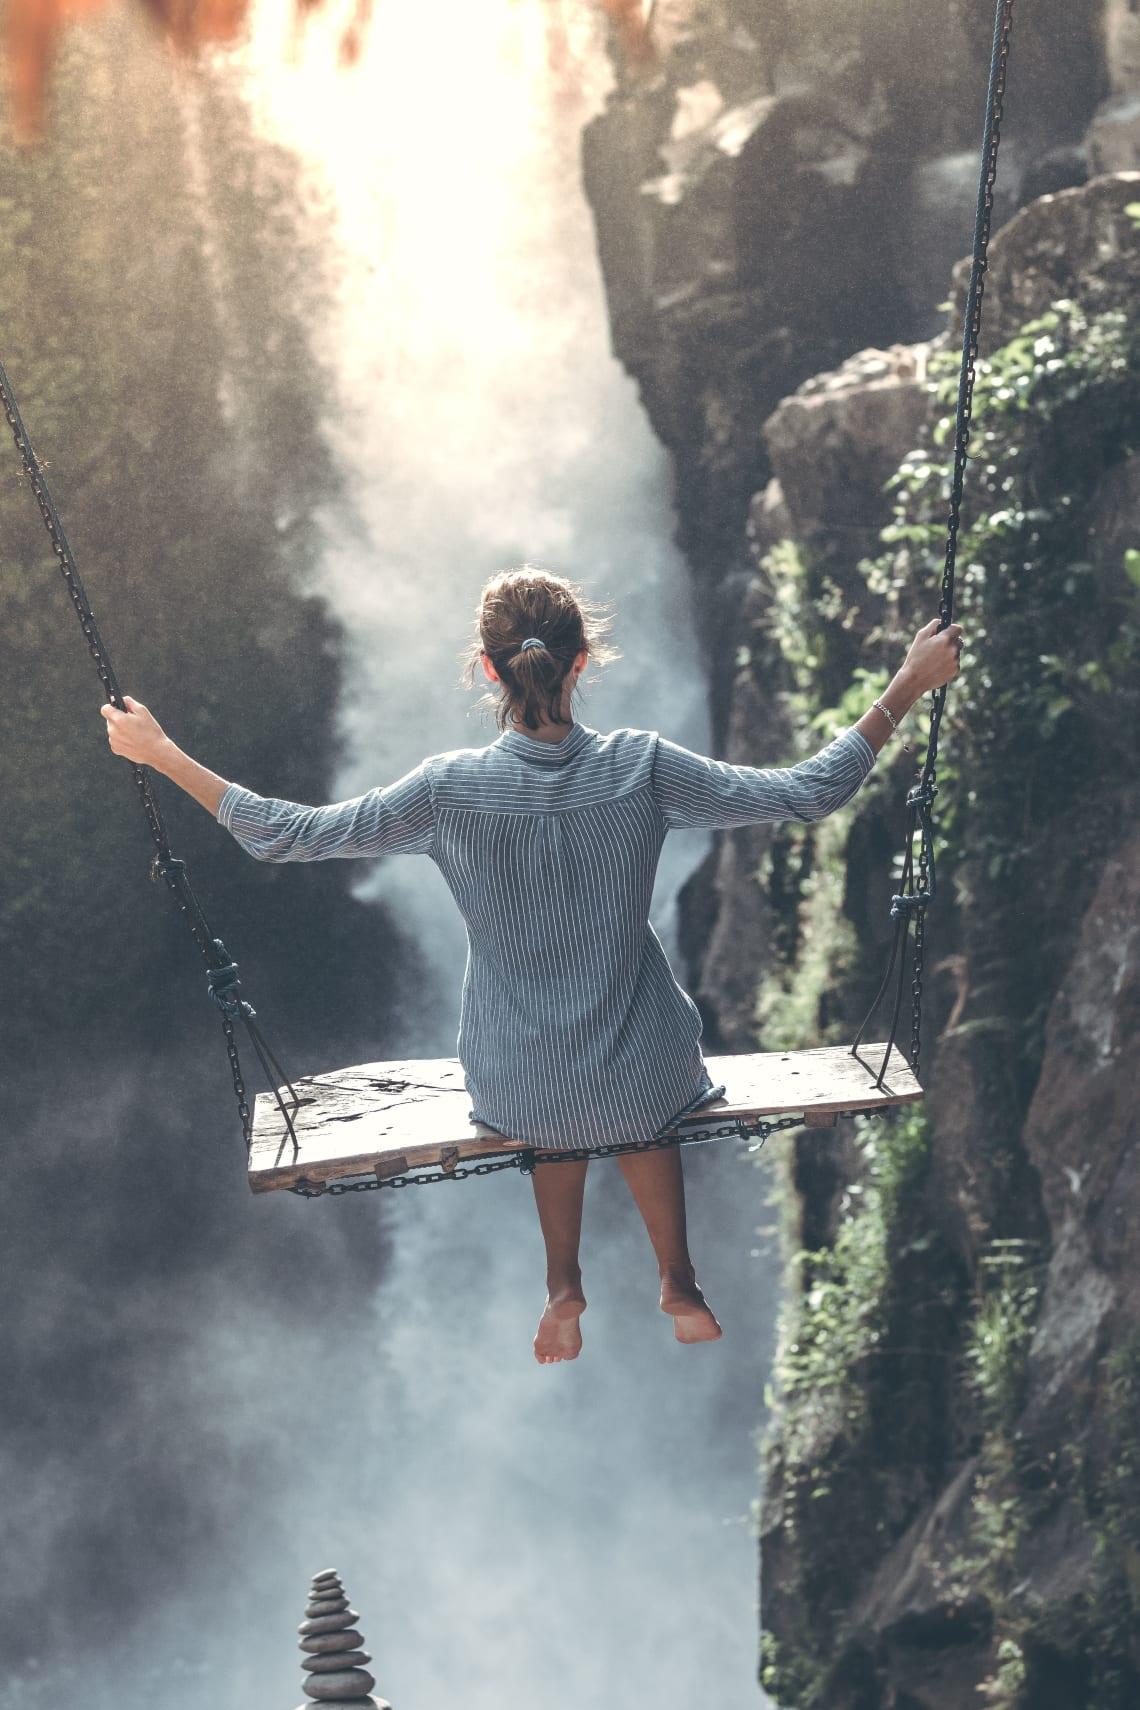 Solo female traveler enjoying a stunning view